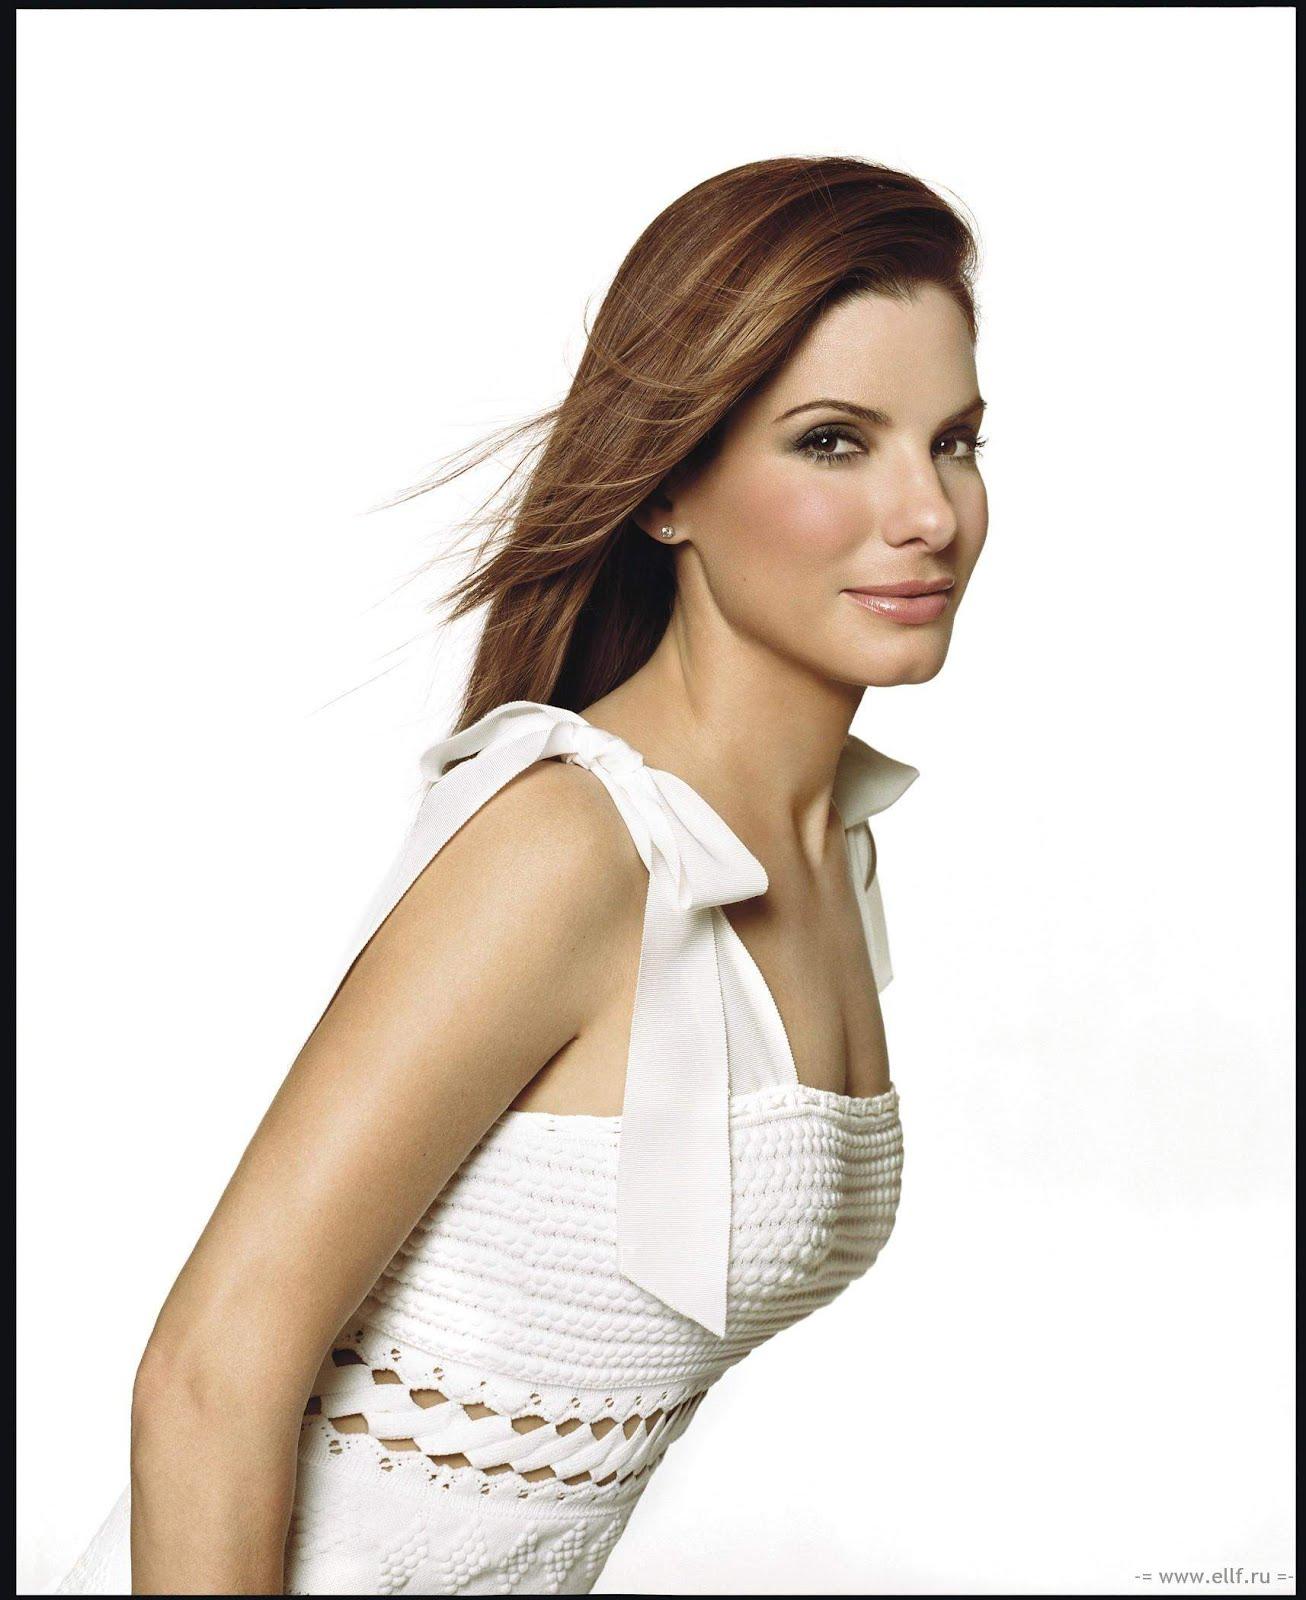 Hollywood Top Actress And Acters: Sandra Bullock Hot